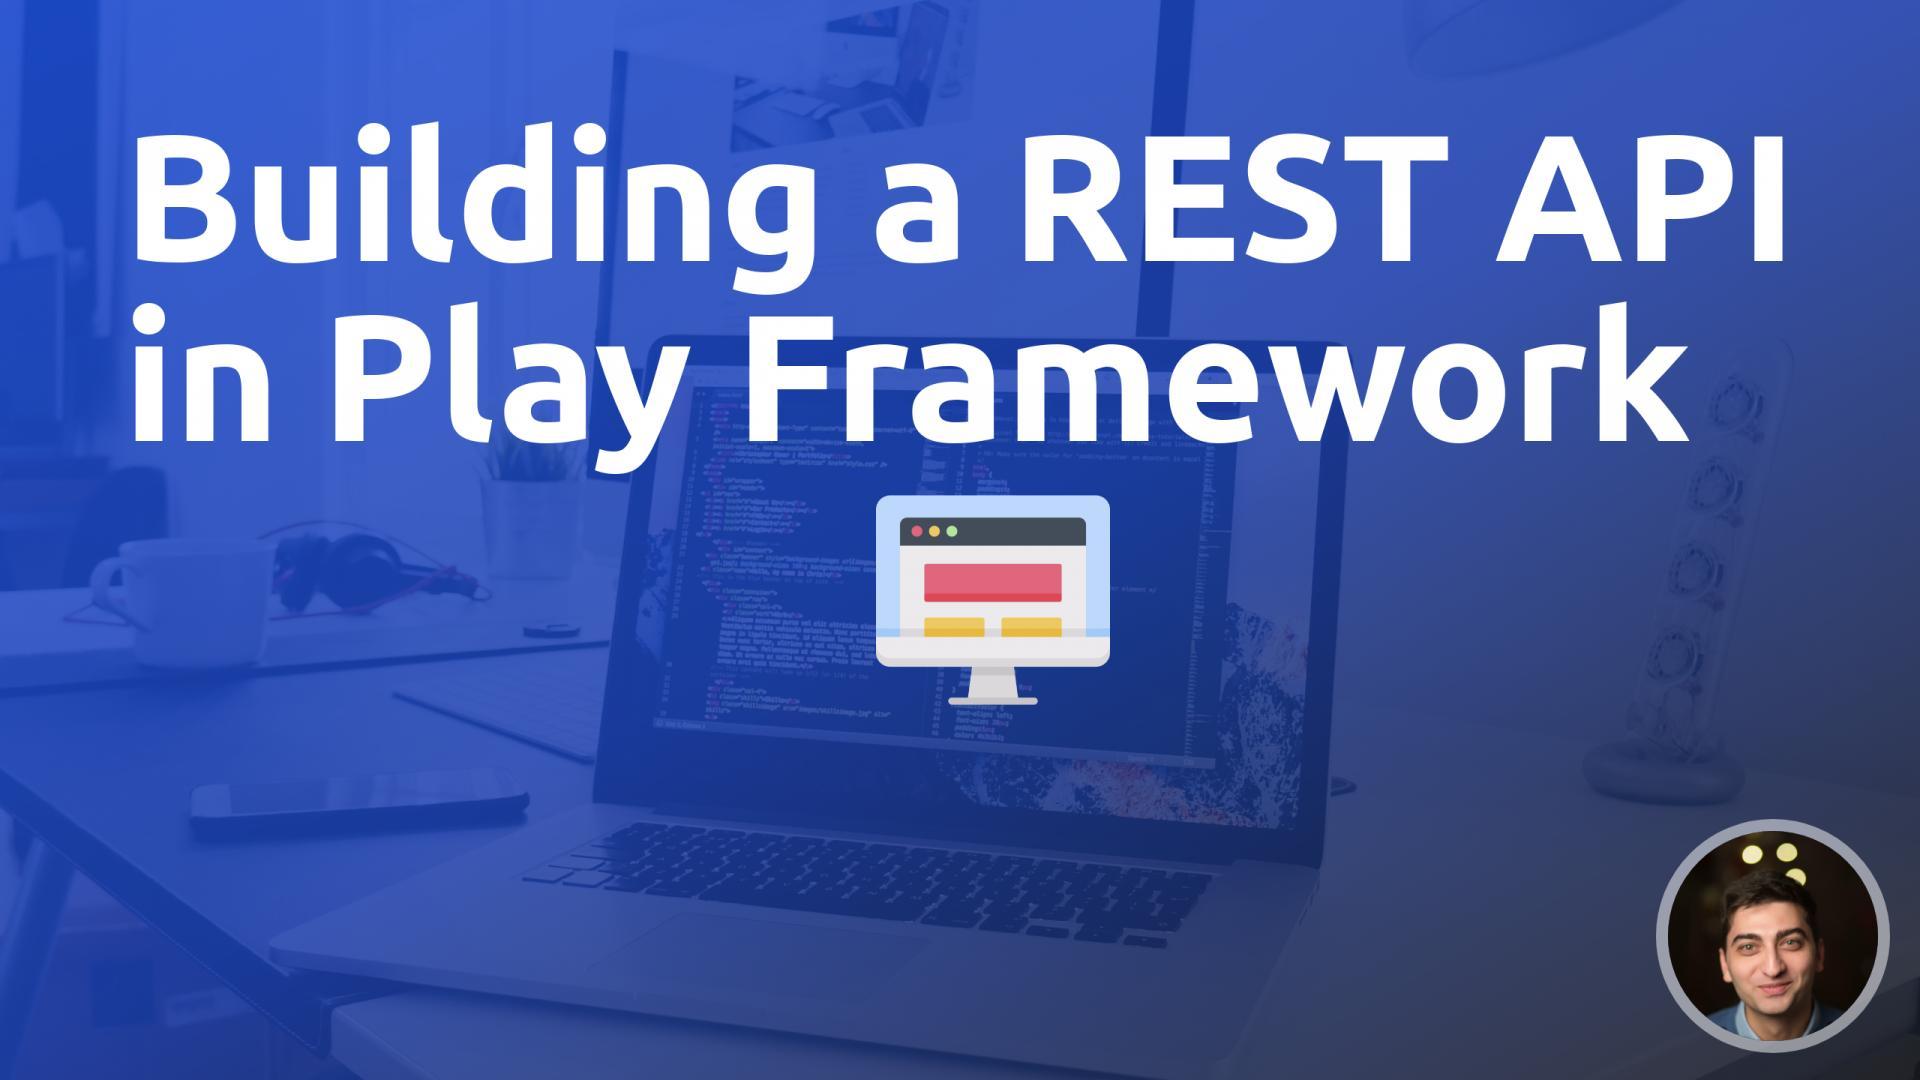 Building a REST API in Play Framework